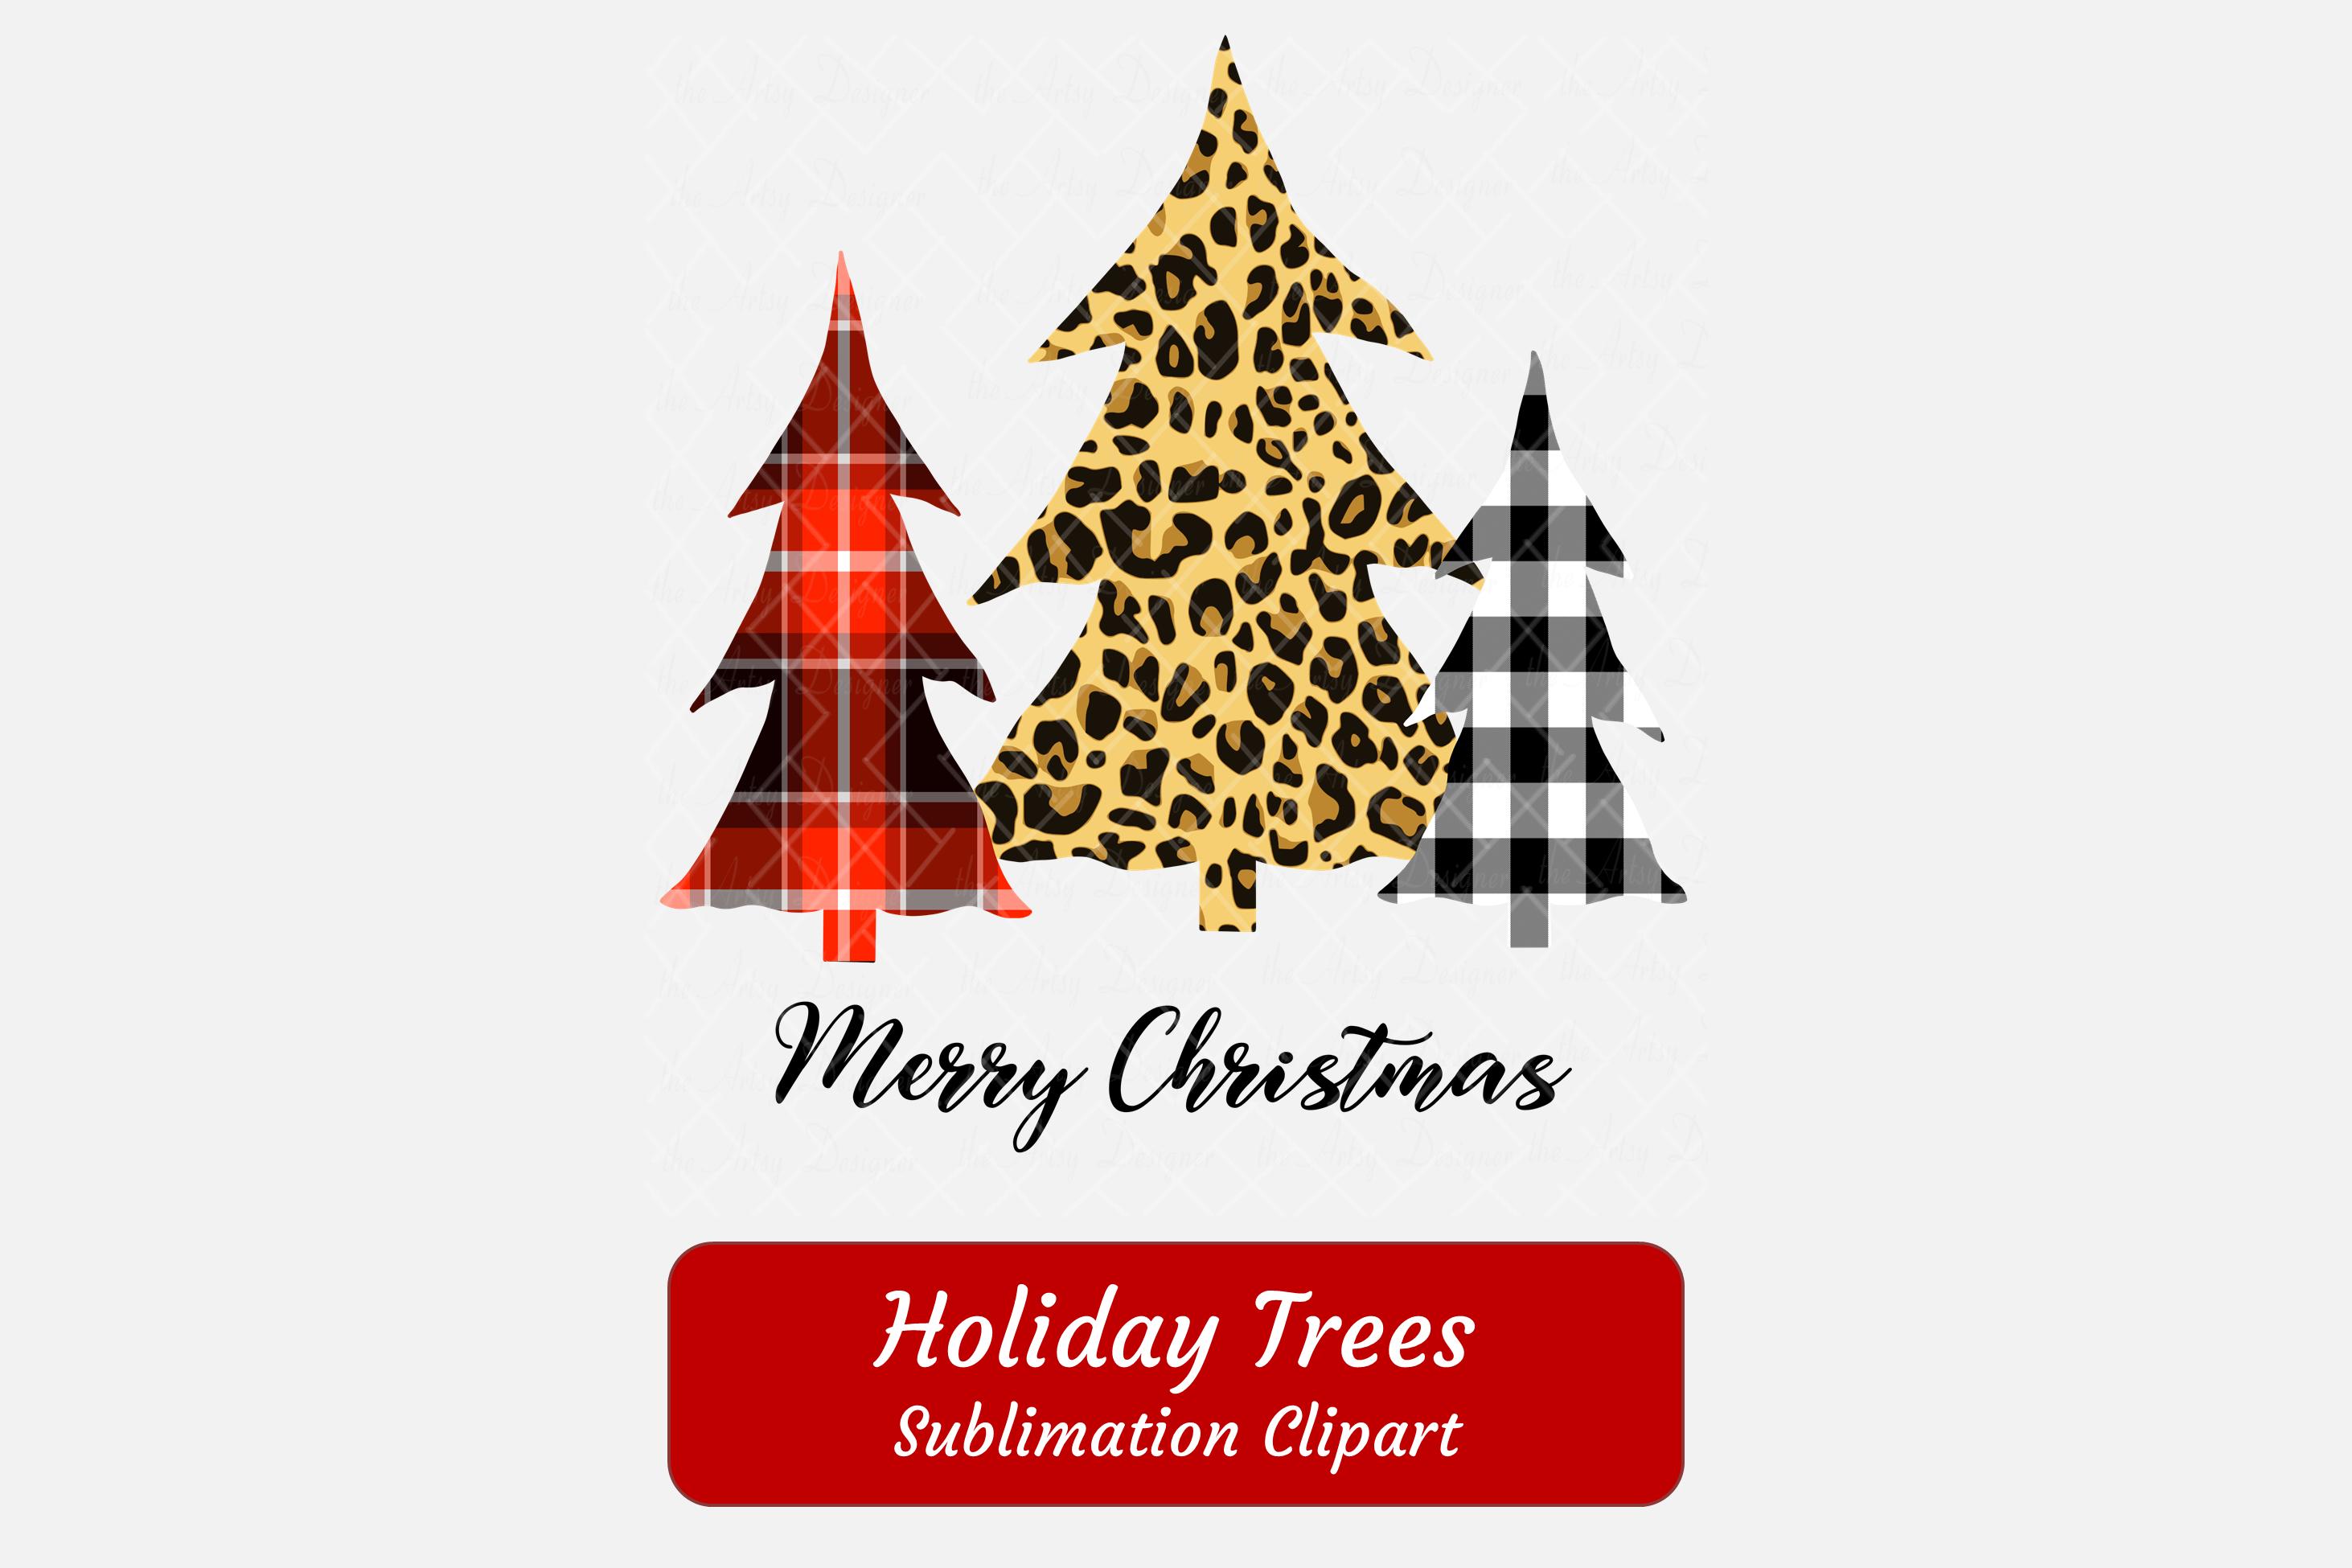 Buffalo Plaid Leopard Print Christmas Trees Sublimation example image 2